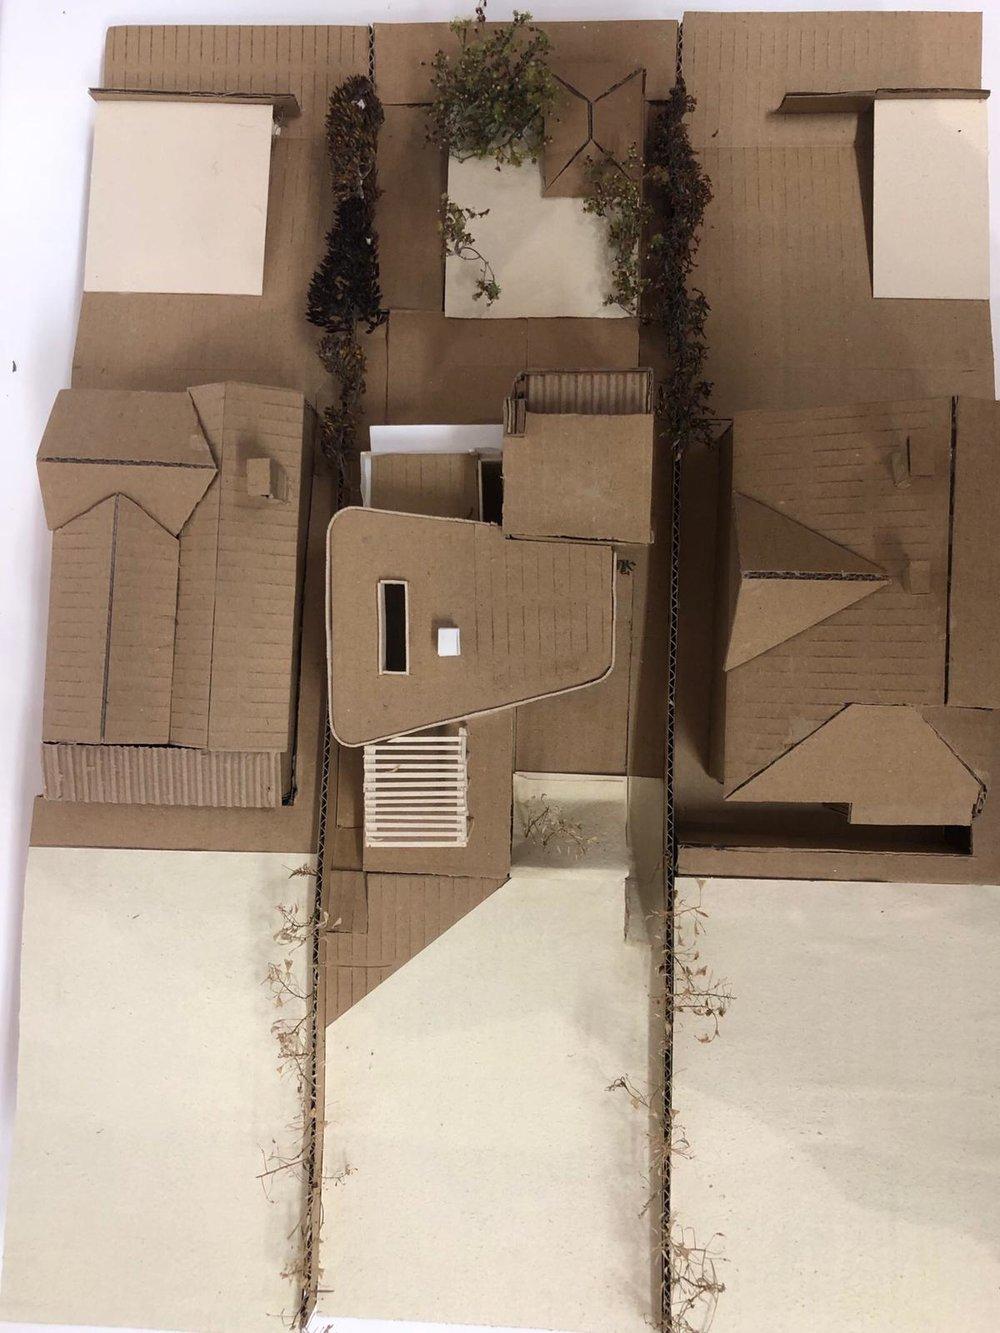 BRENNAN_FURLONG_NEW_HOUSE_MODEL_HOWTH_SUMMIT.jpg